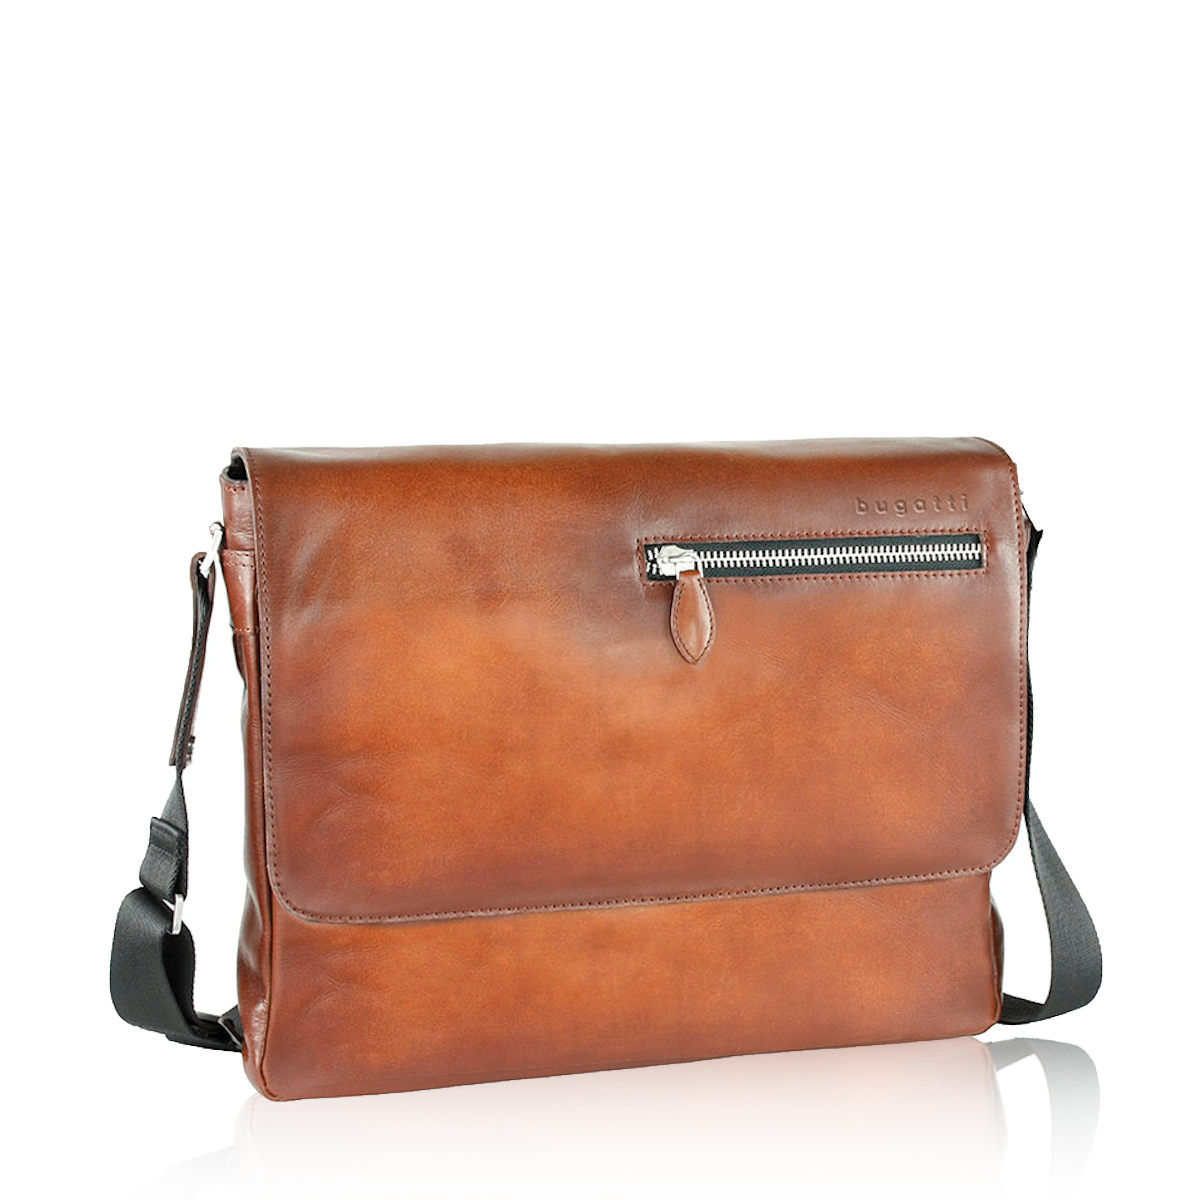 Bugatti pánska kožená praktická notebooková taška - koňaková